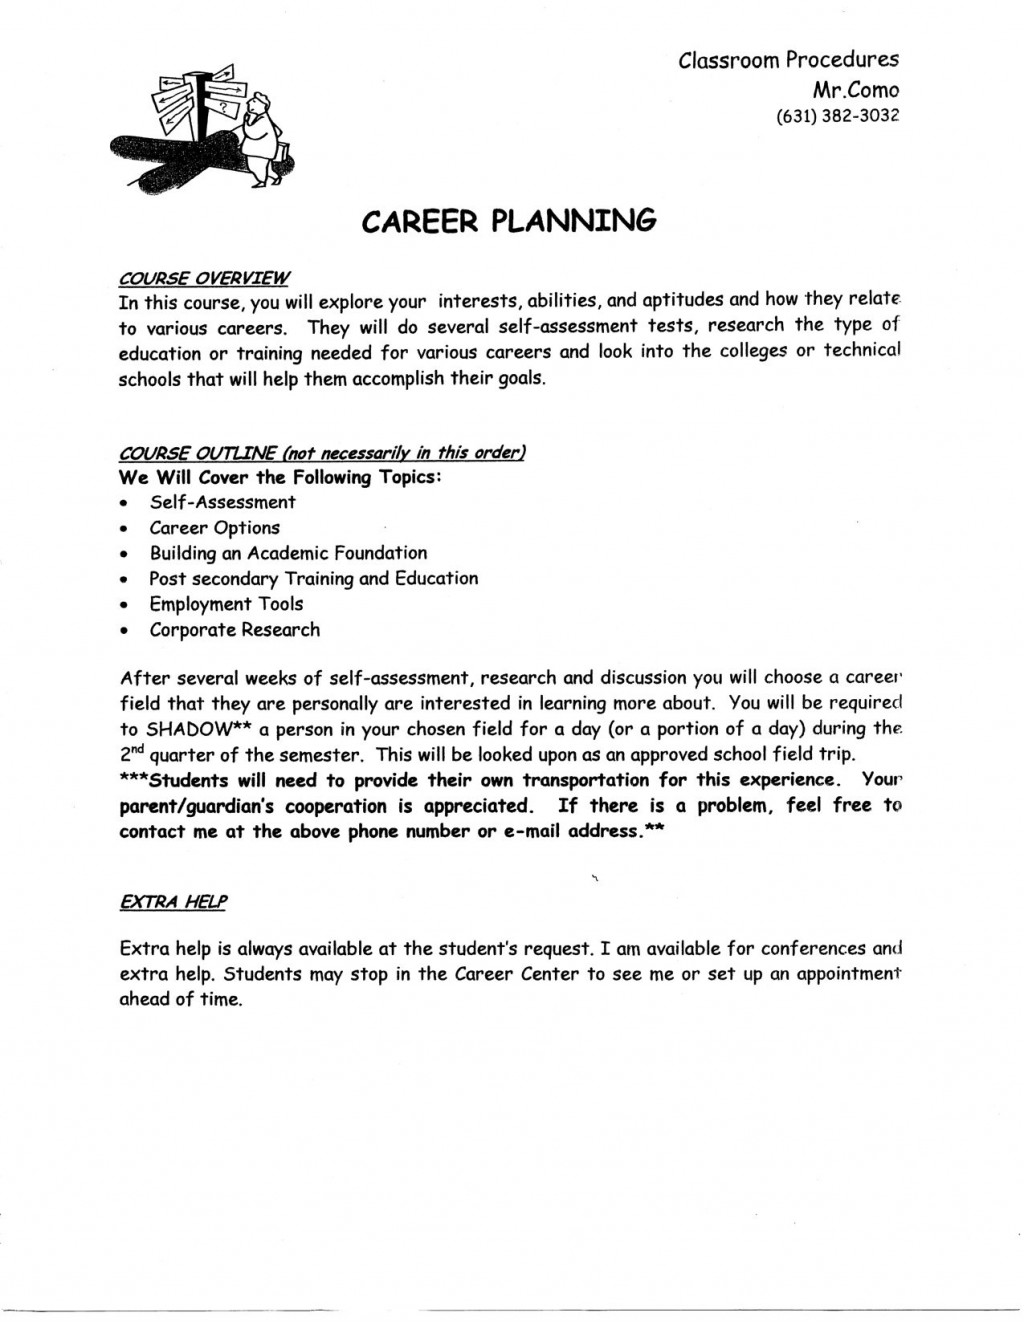 007 Career Development Essay Example Plans Template Plan Planni Outline Goal Exploration Nursing Wonderful Topics Program Large